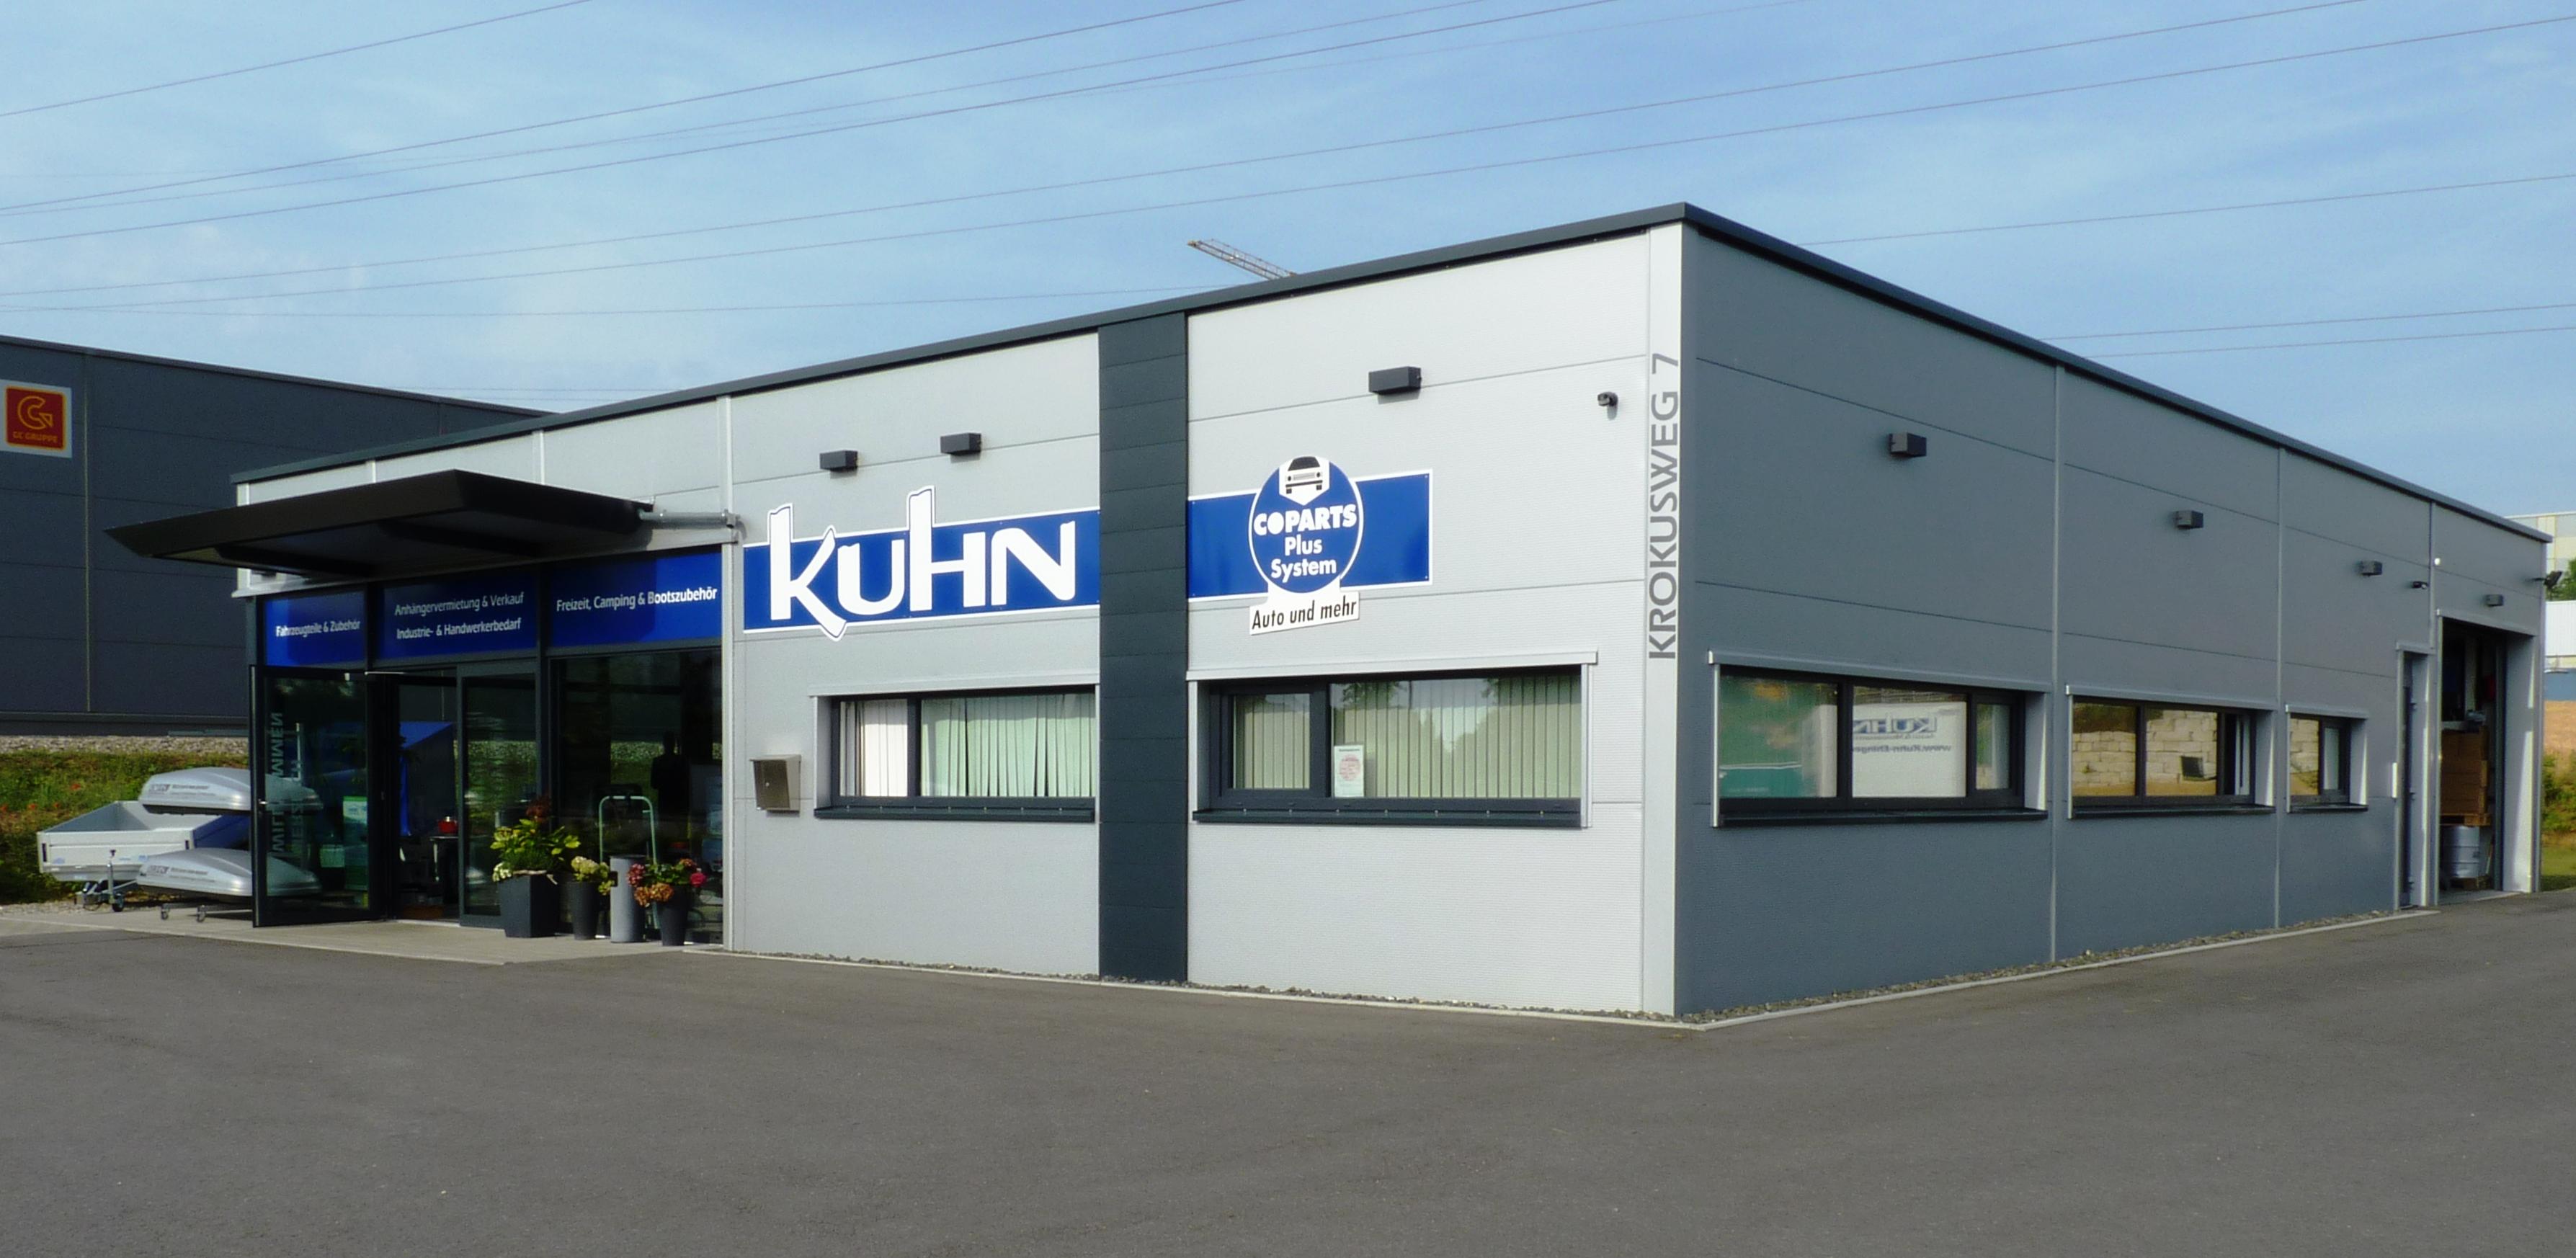 Foto de Auto- & Motorradteile Kuhn